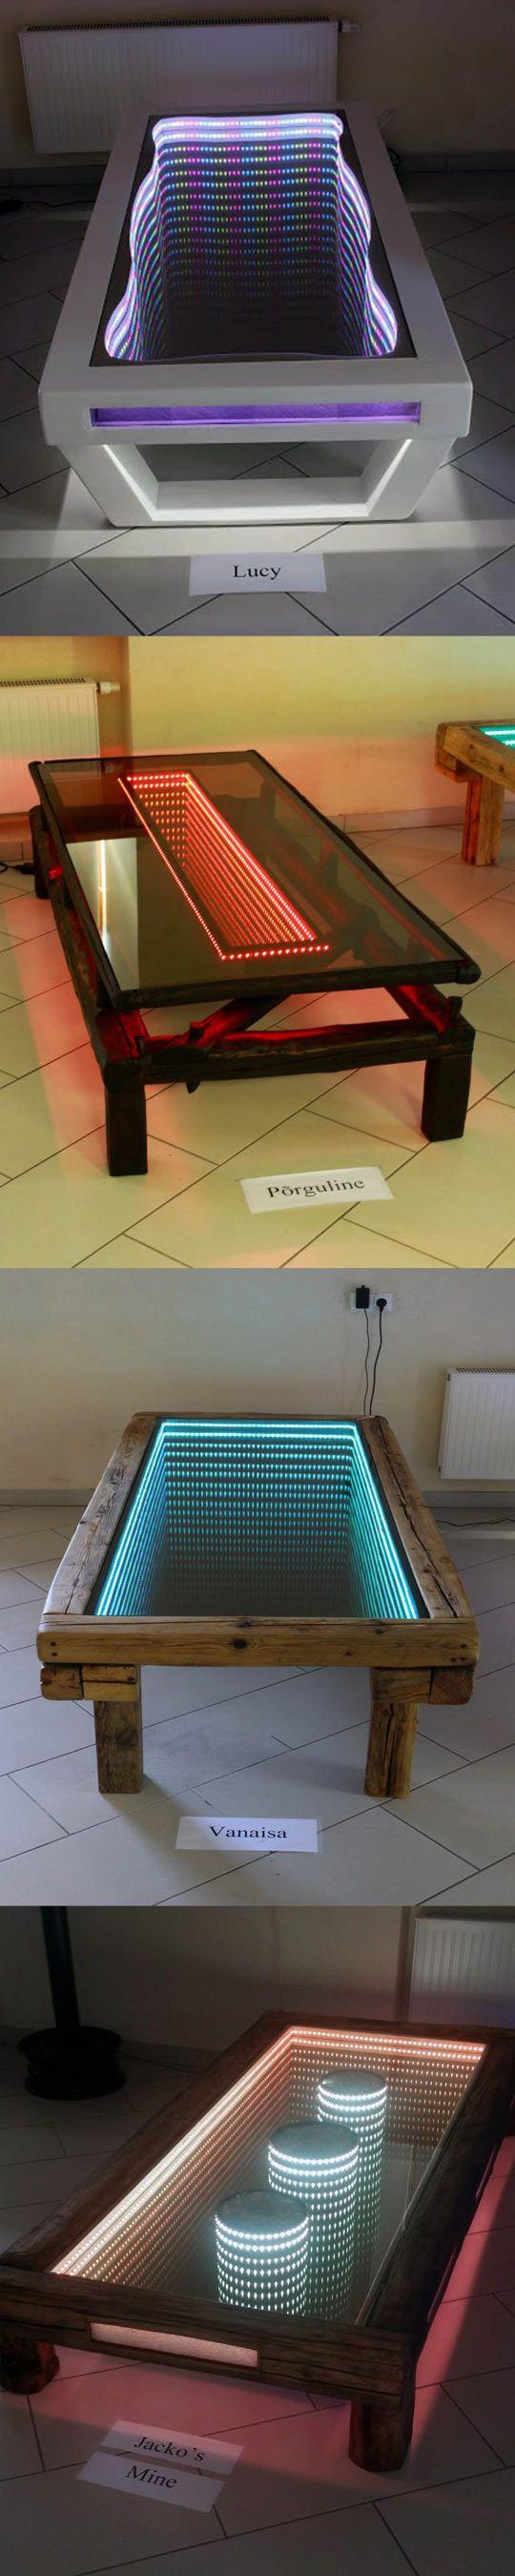 Handmade Infinity Tables